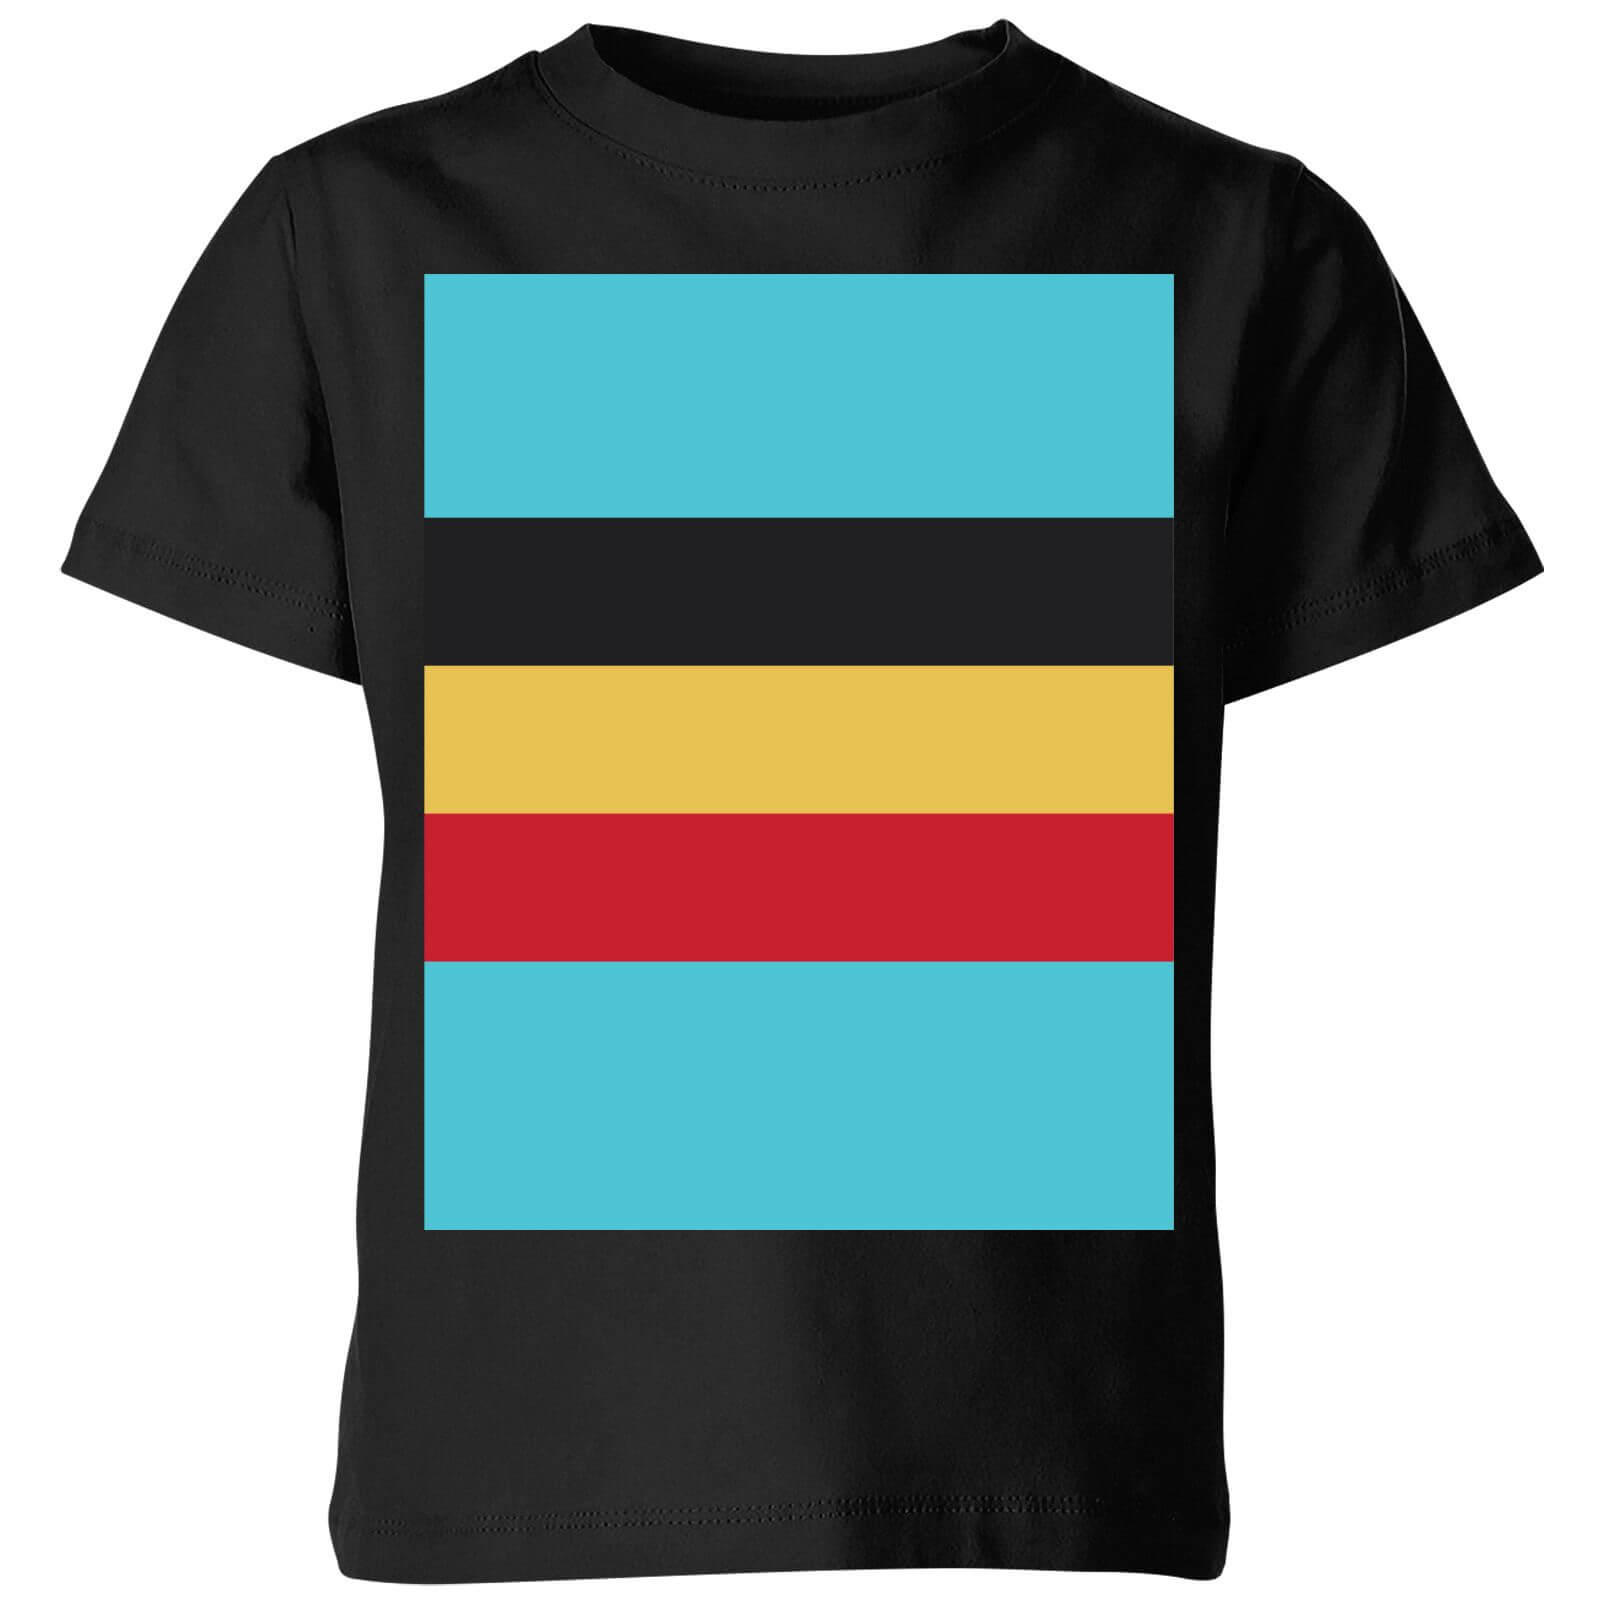 Summit Finish Belgium Flag Kids T-shirt - Black - 5-6 Years - Black